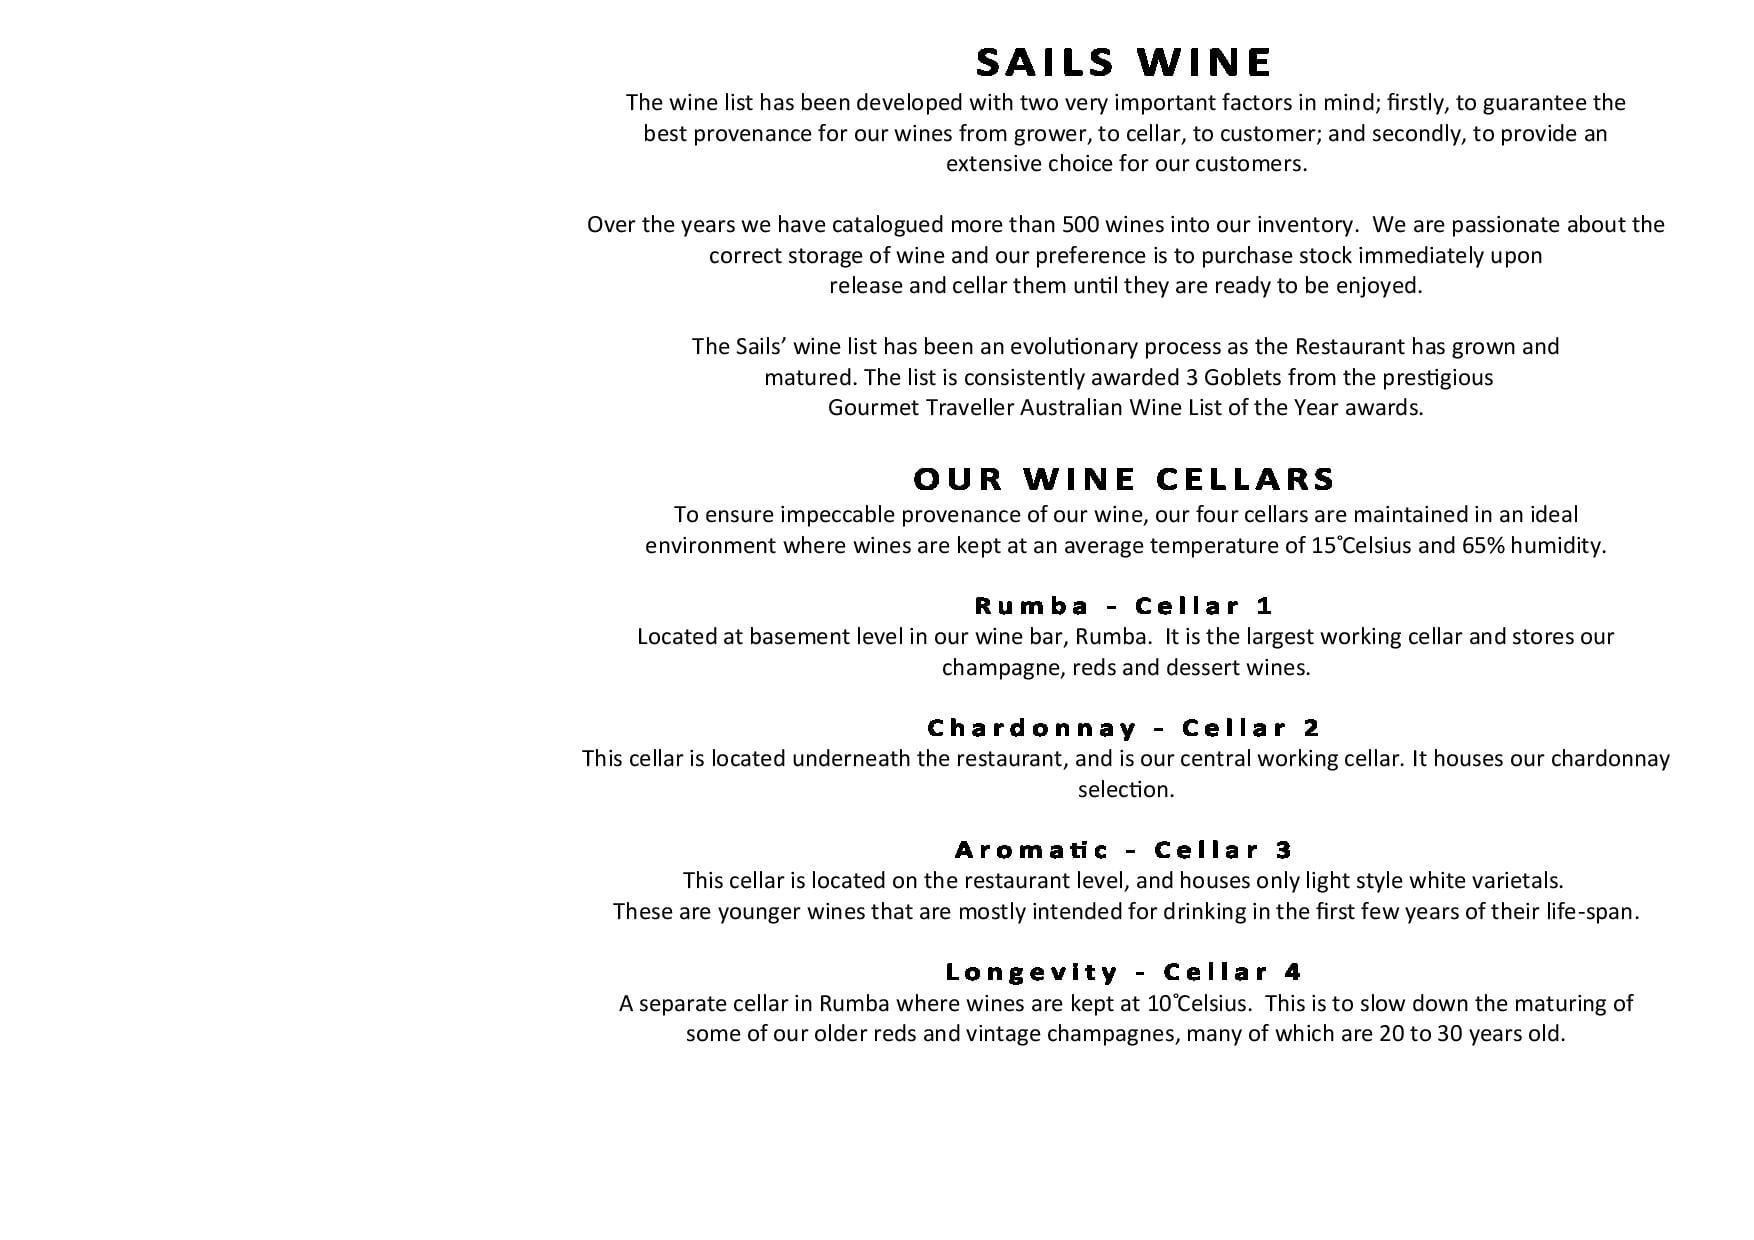 Sails Wine List 2020 Page 003